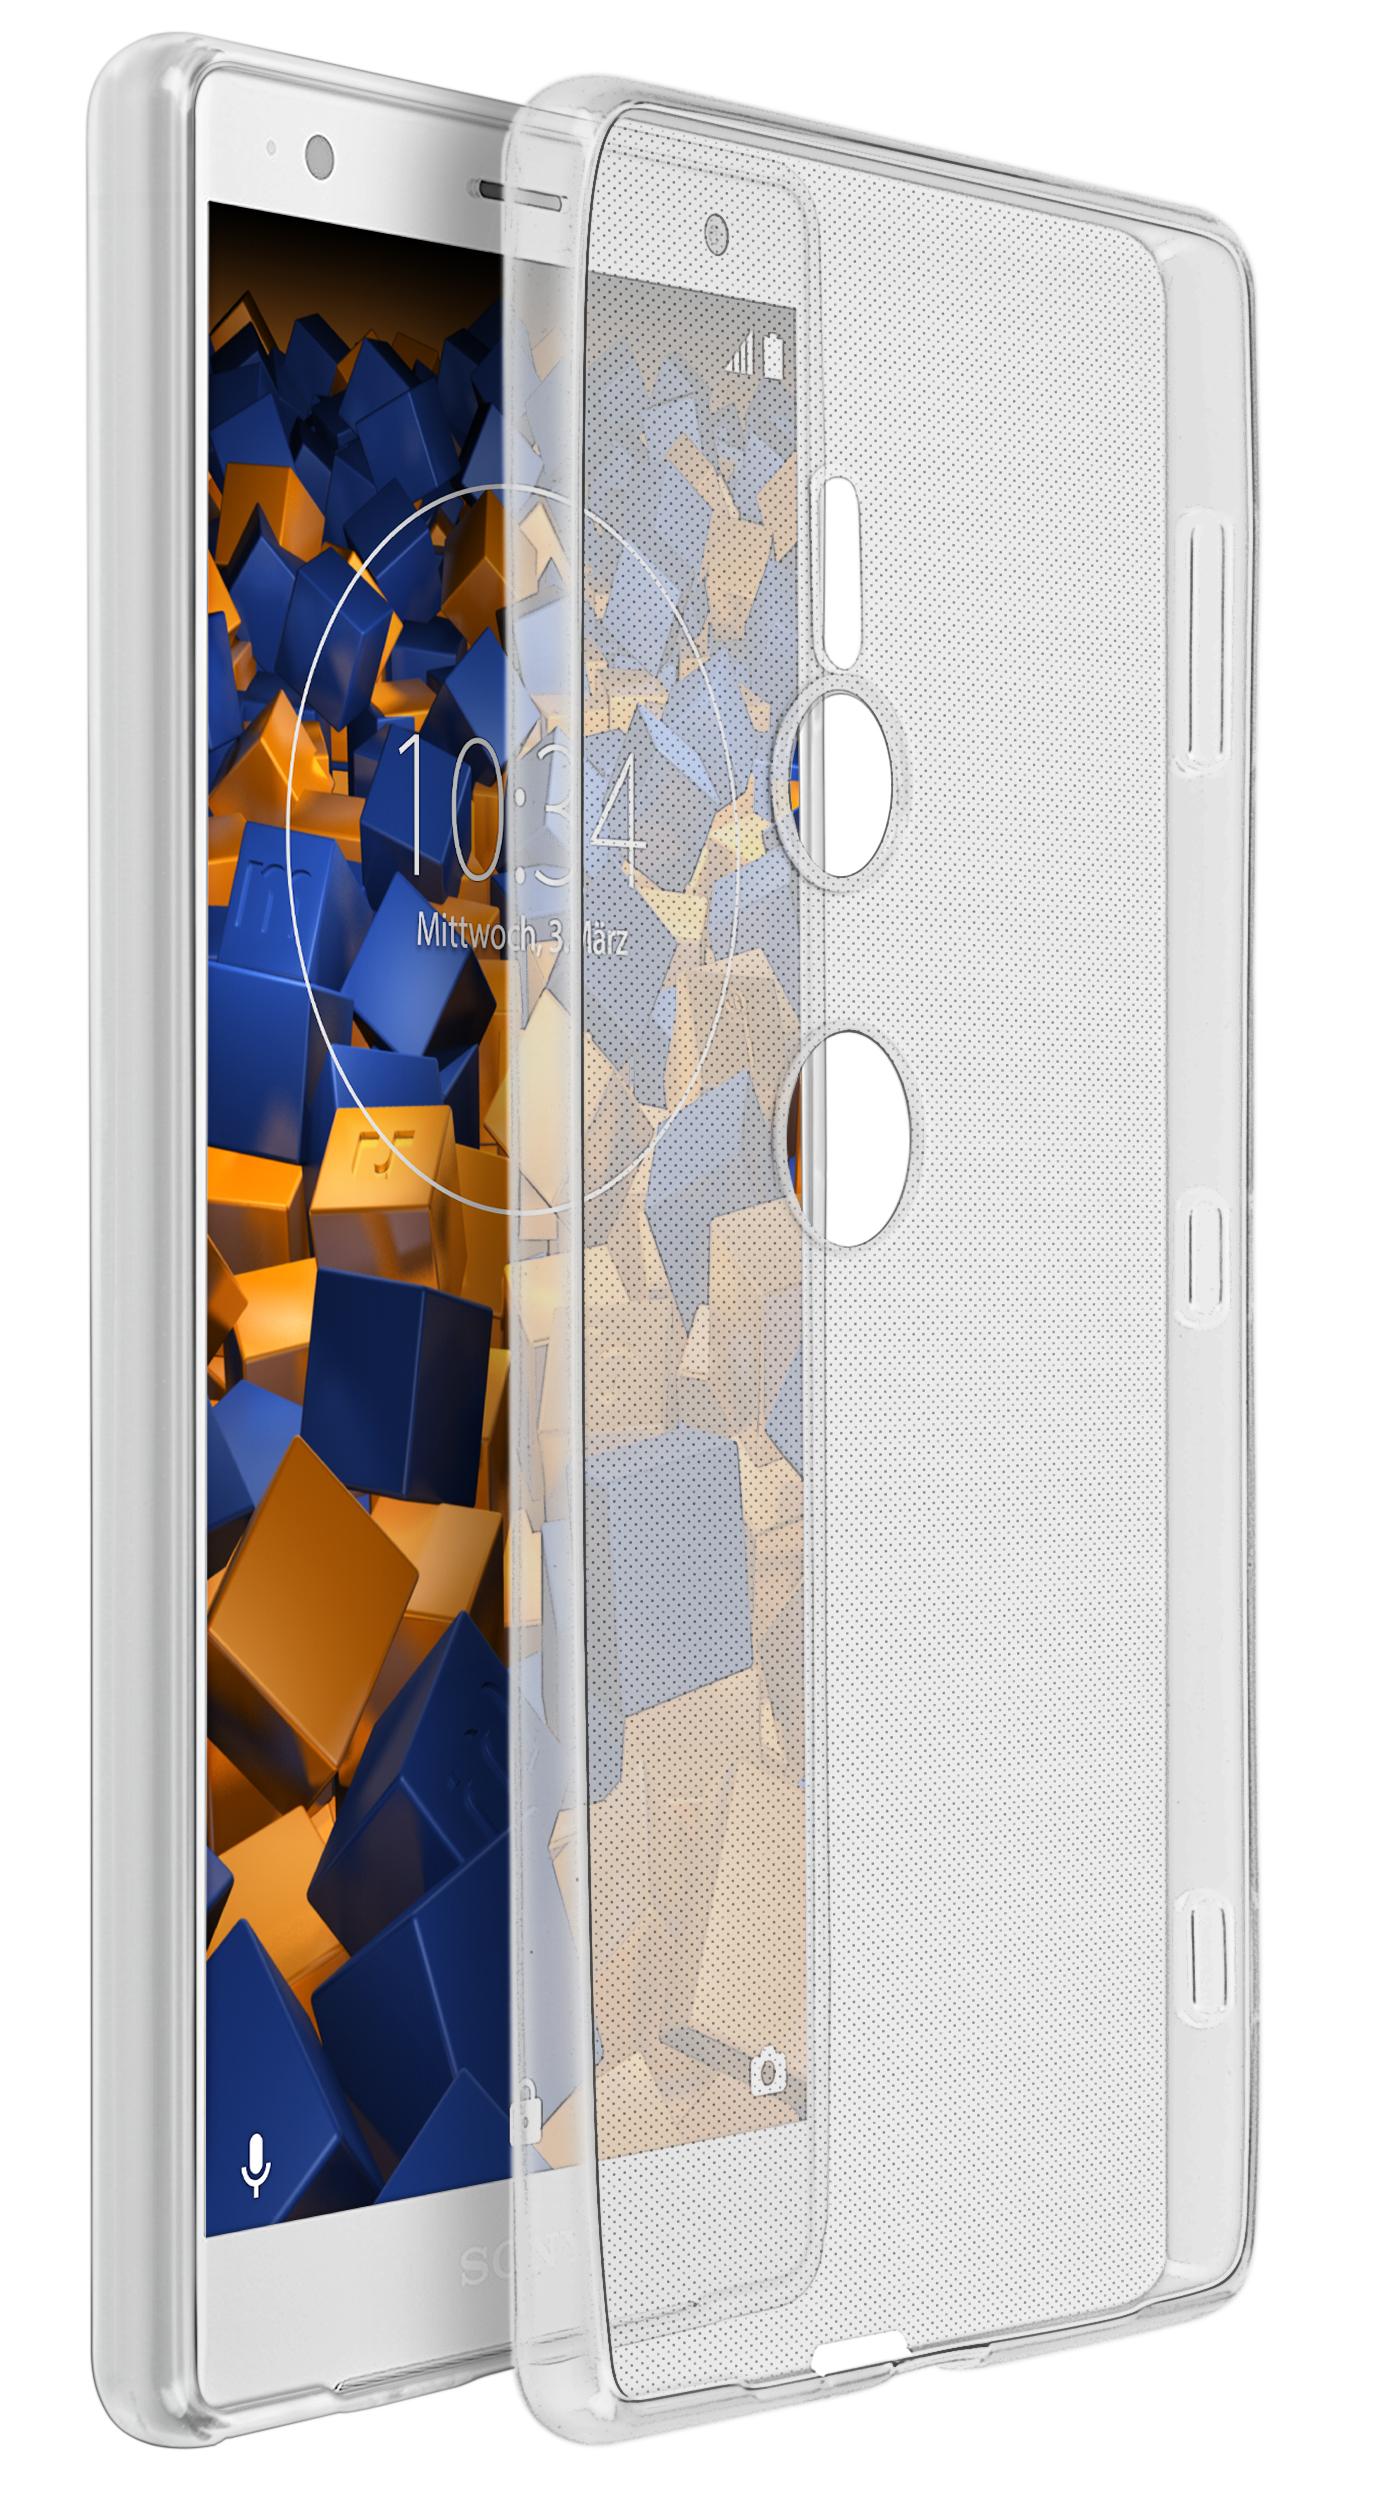 1 mumbi O1 tpu huelle schutzhuelle case bumper ultra slim Sony Xperia XZ2